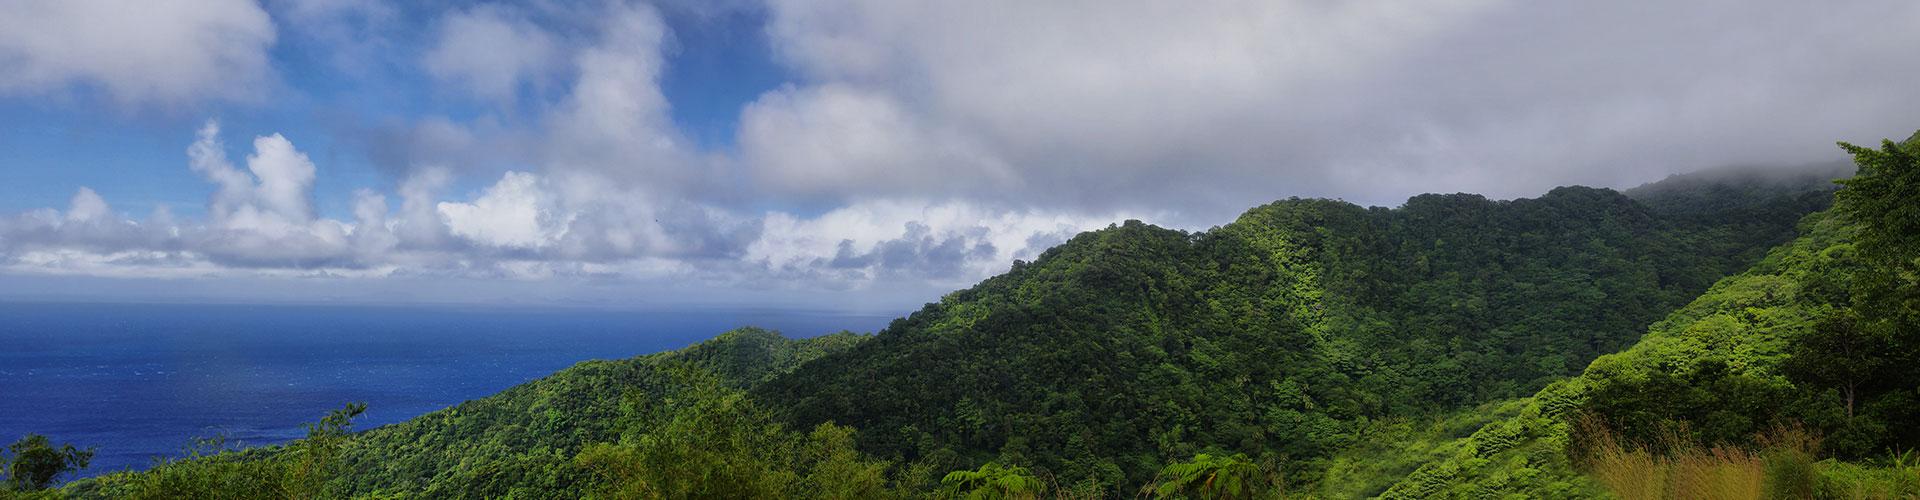 Landmark photograph of Dominica